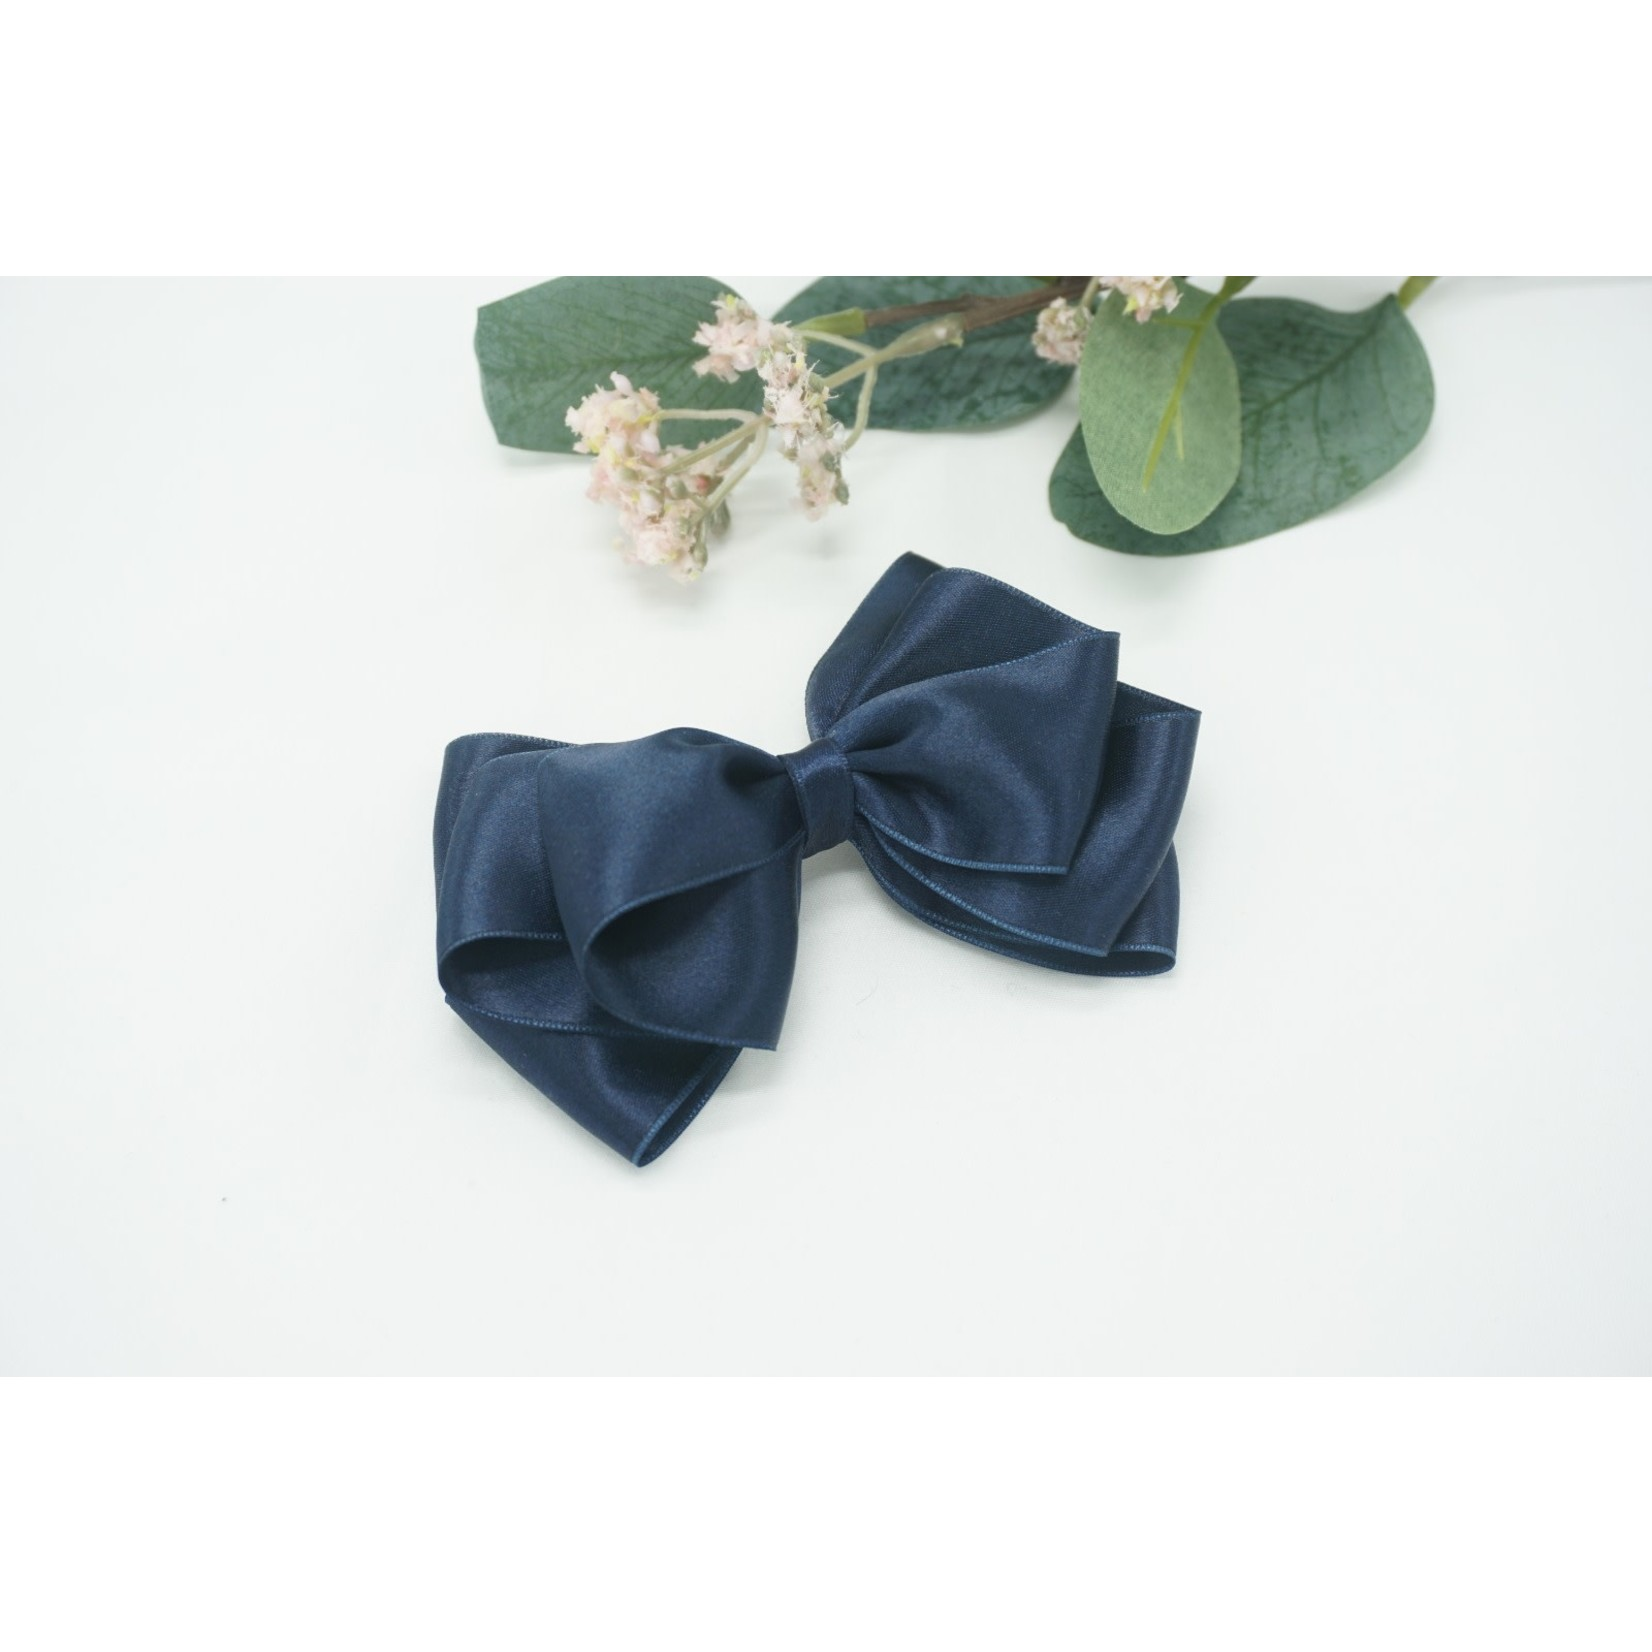 Petite Zara Copy of Butterfly Bow - Pink 12cm